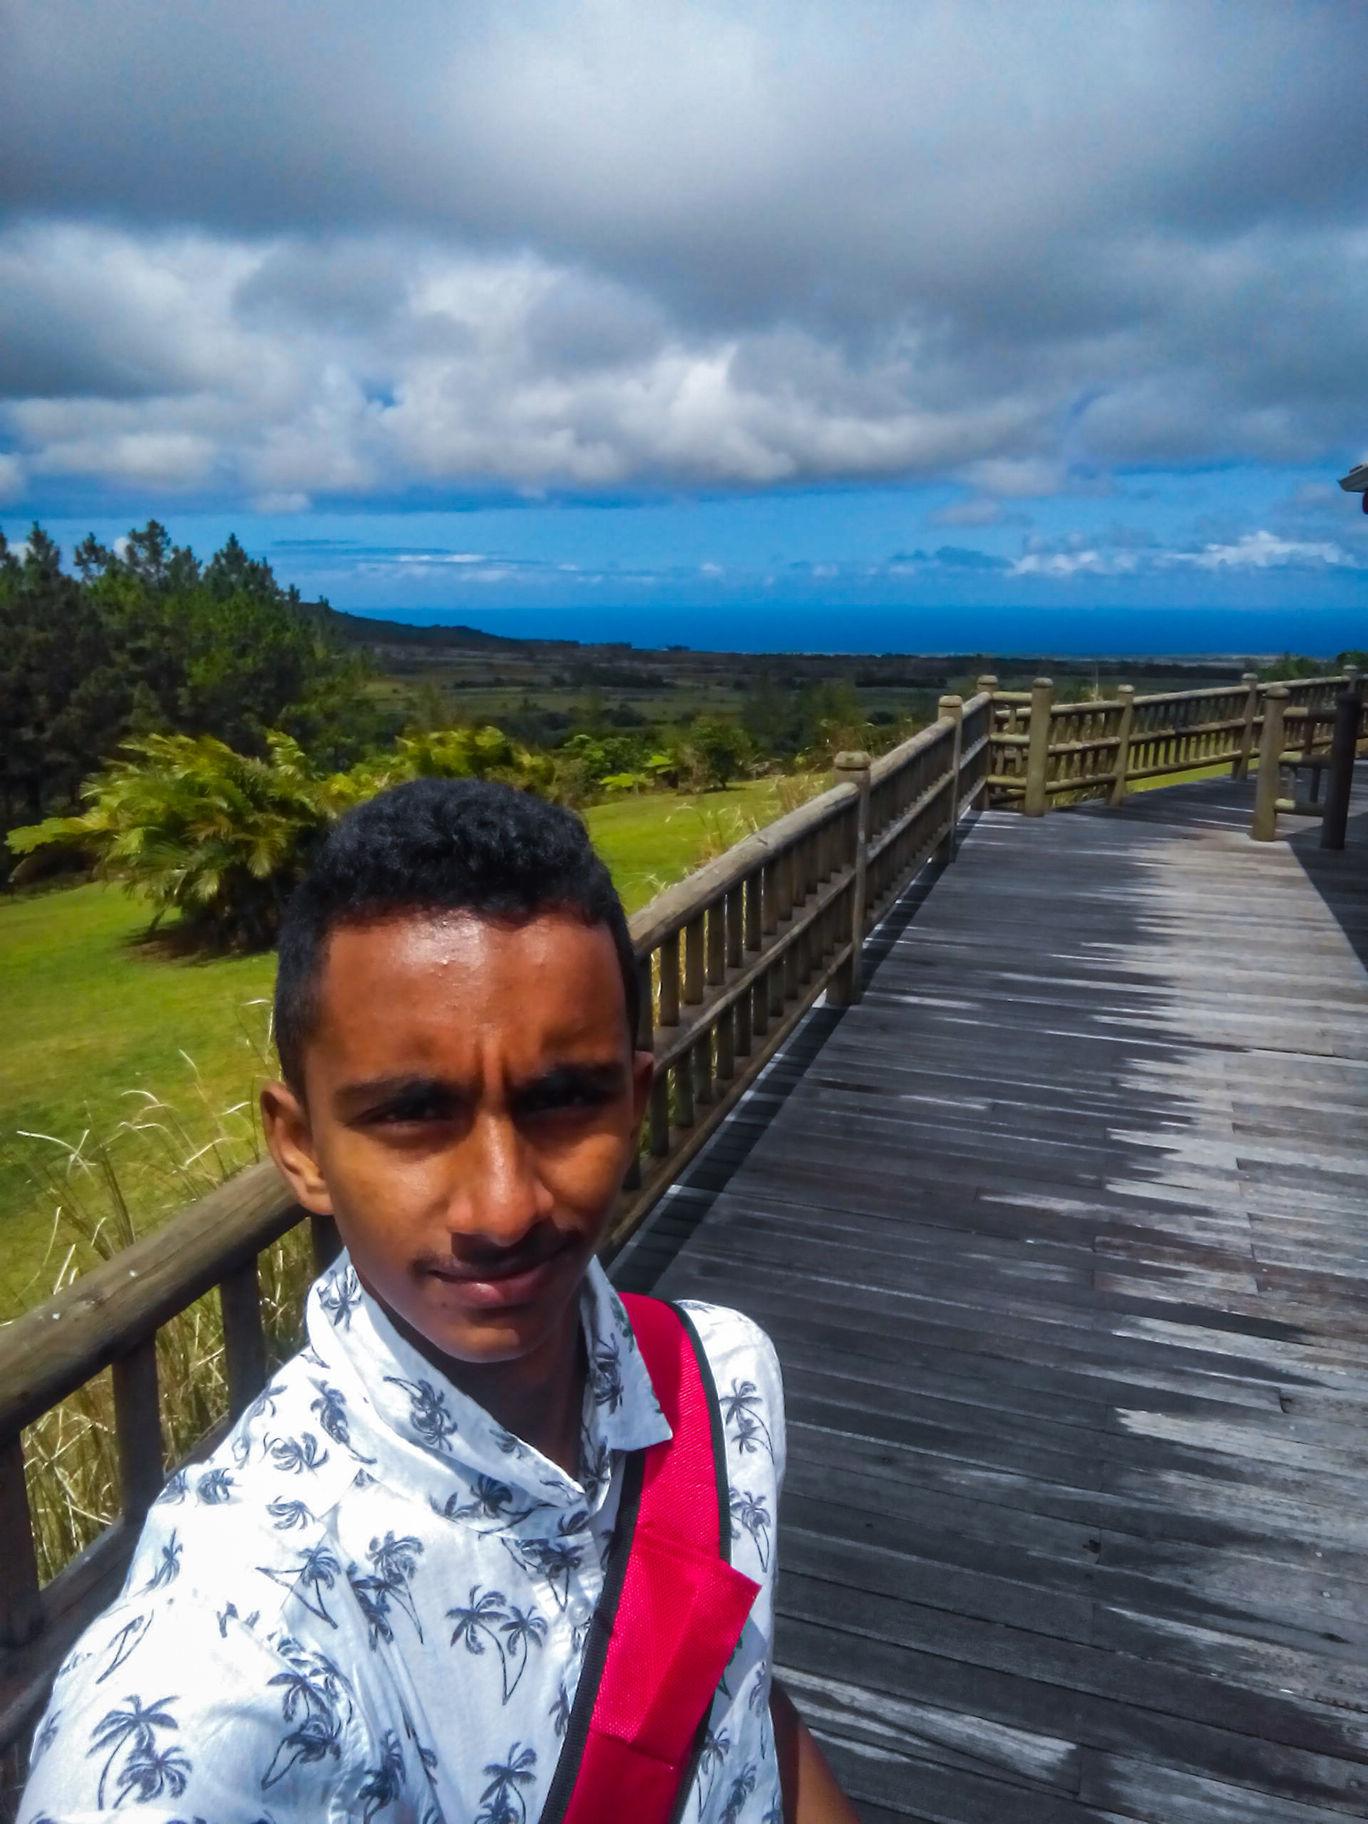 Photo of Mauritius By Harish Muniyandi